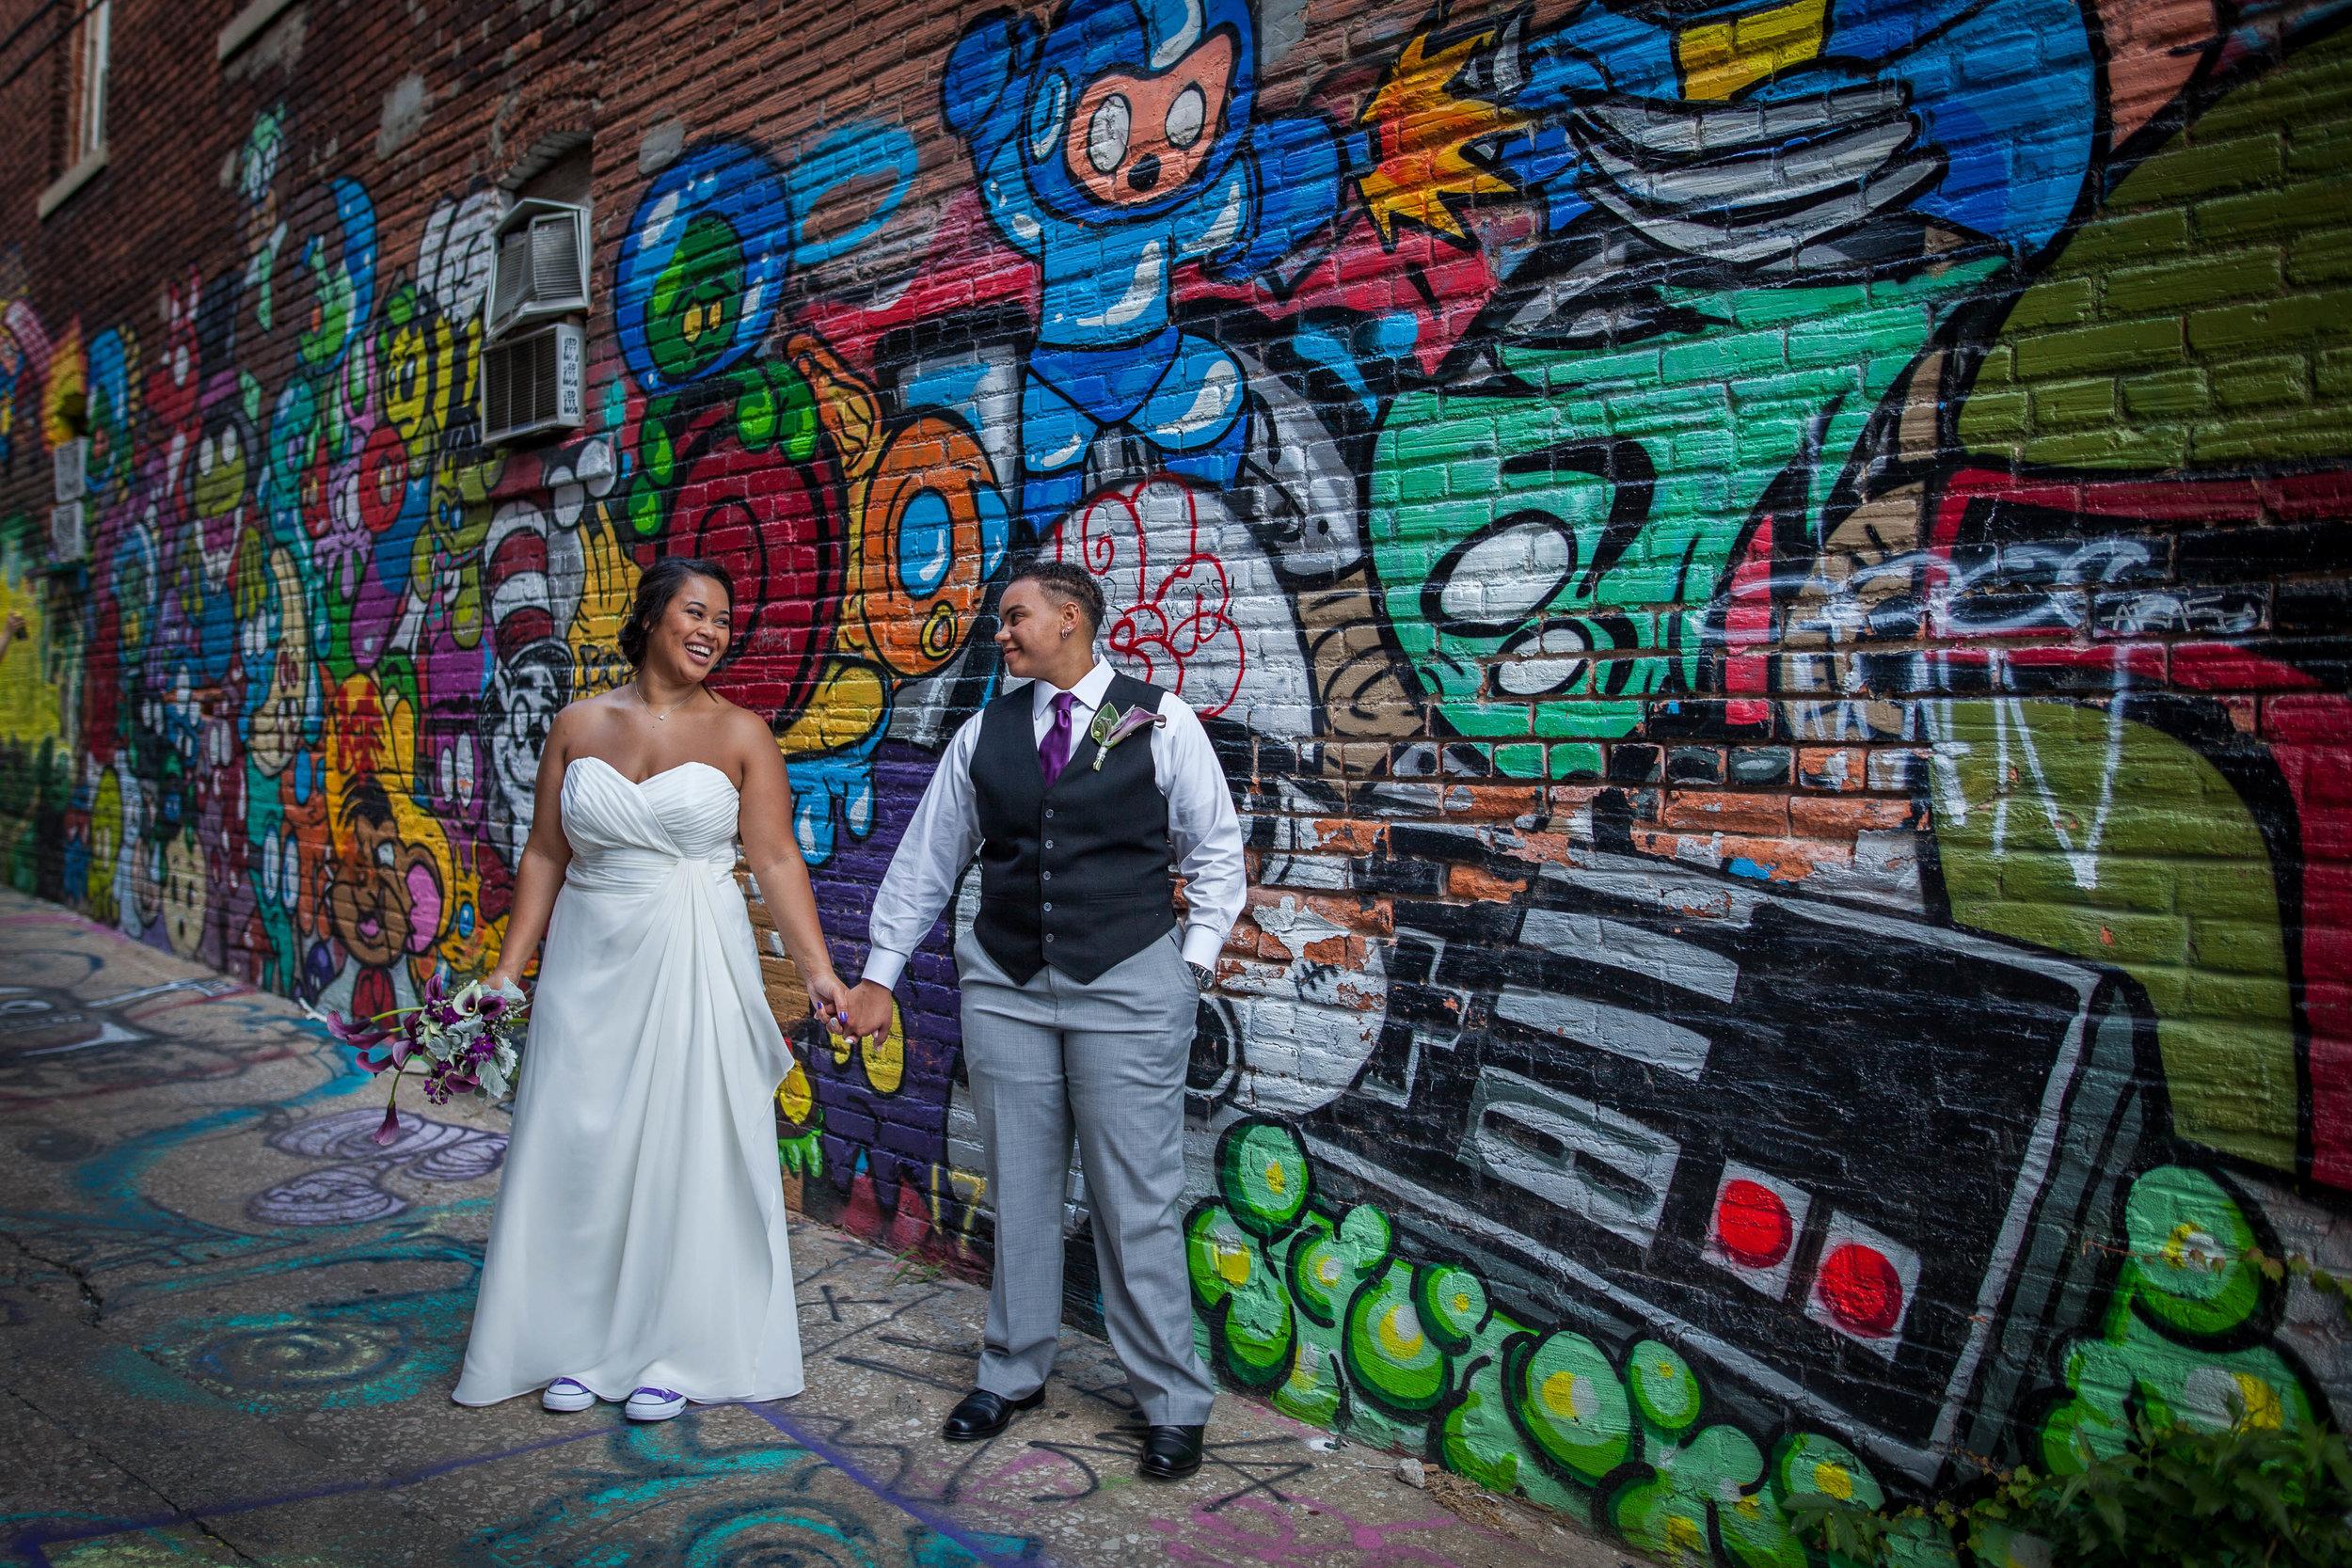 Kansas+City_Small+Wedding_Venue_Elope_Intimate_Ceremony_Constance & Carissa-261.jpg